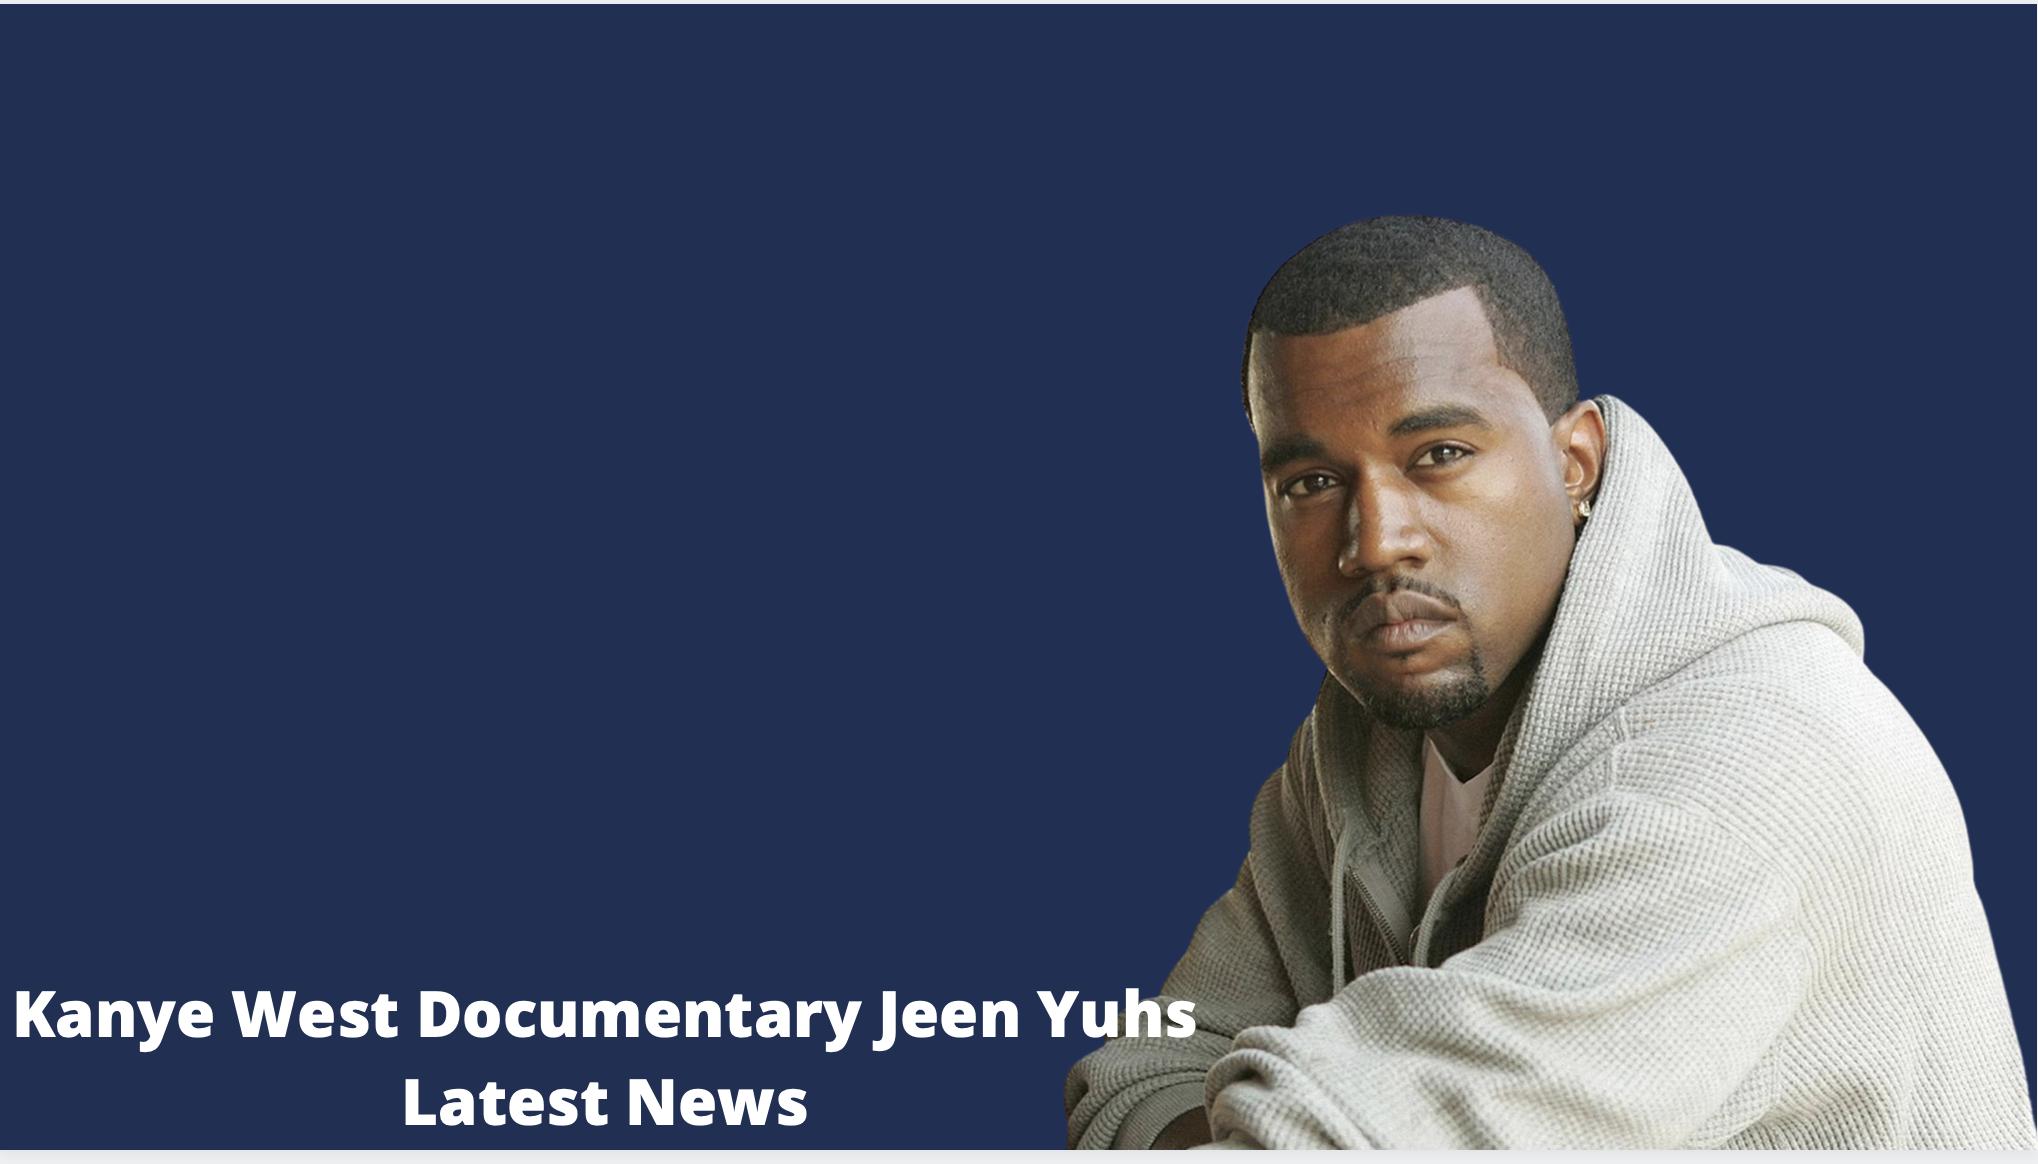 Kanye West Documentary Jeen Yuhs Latest News